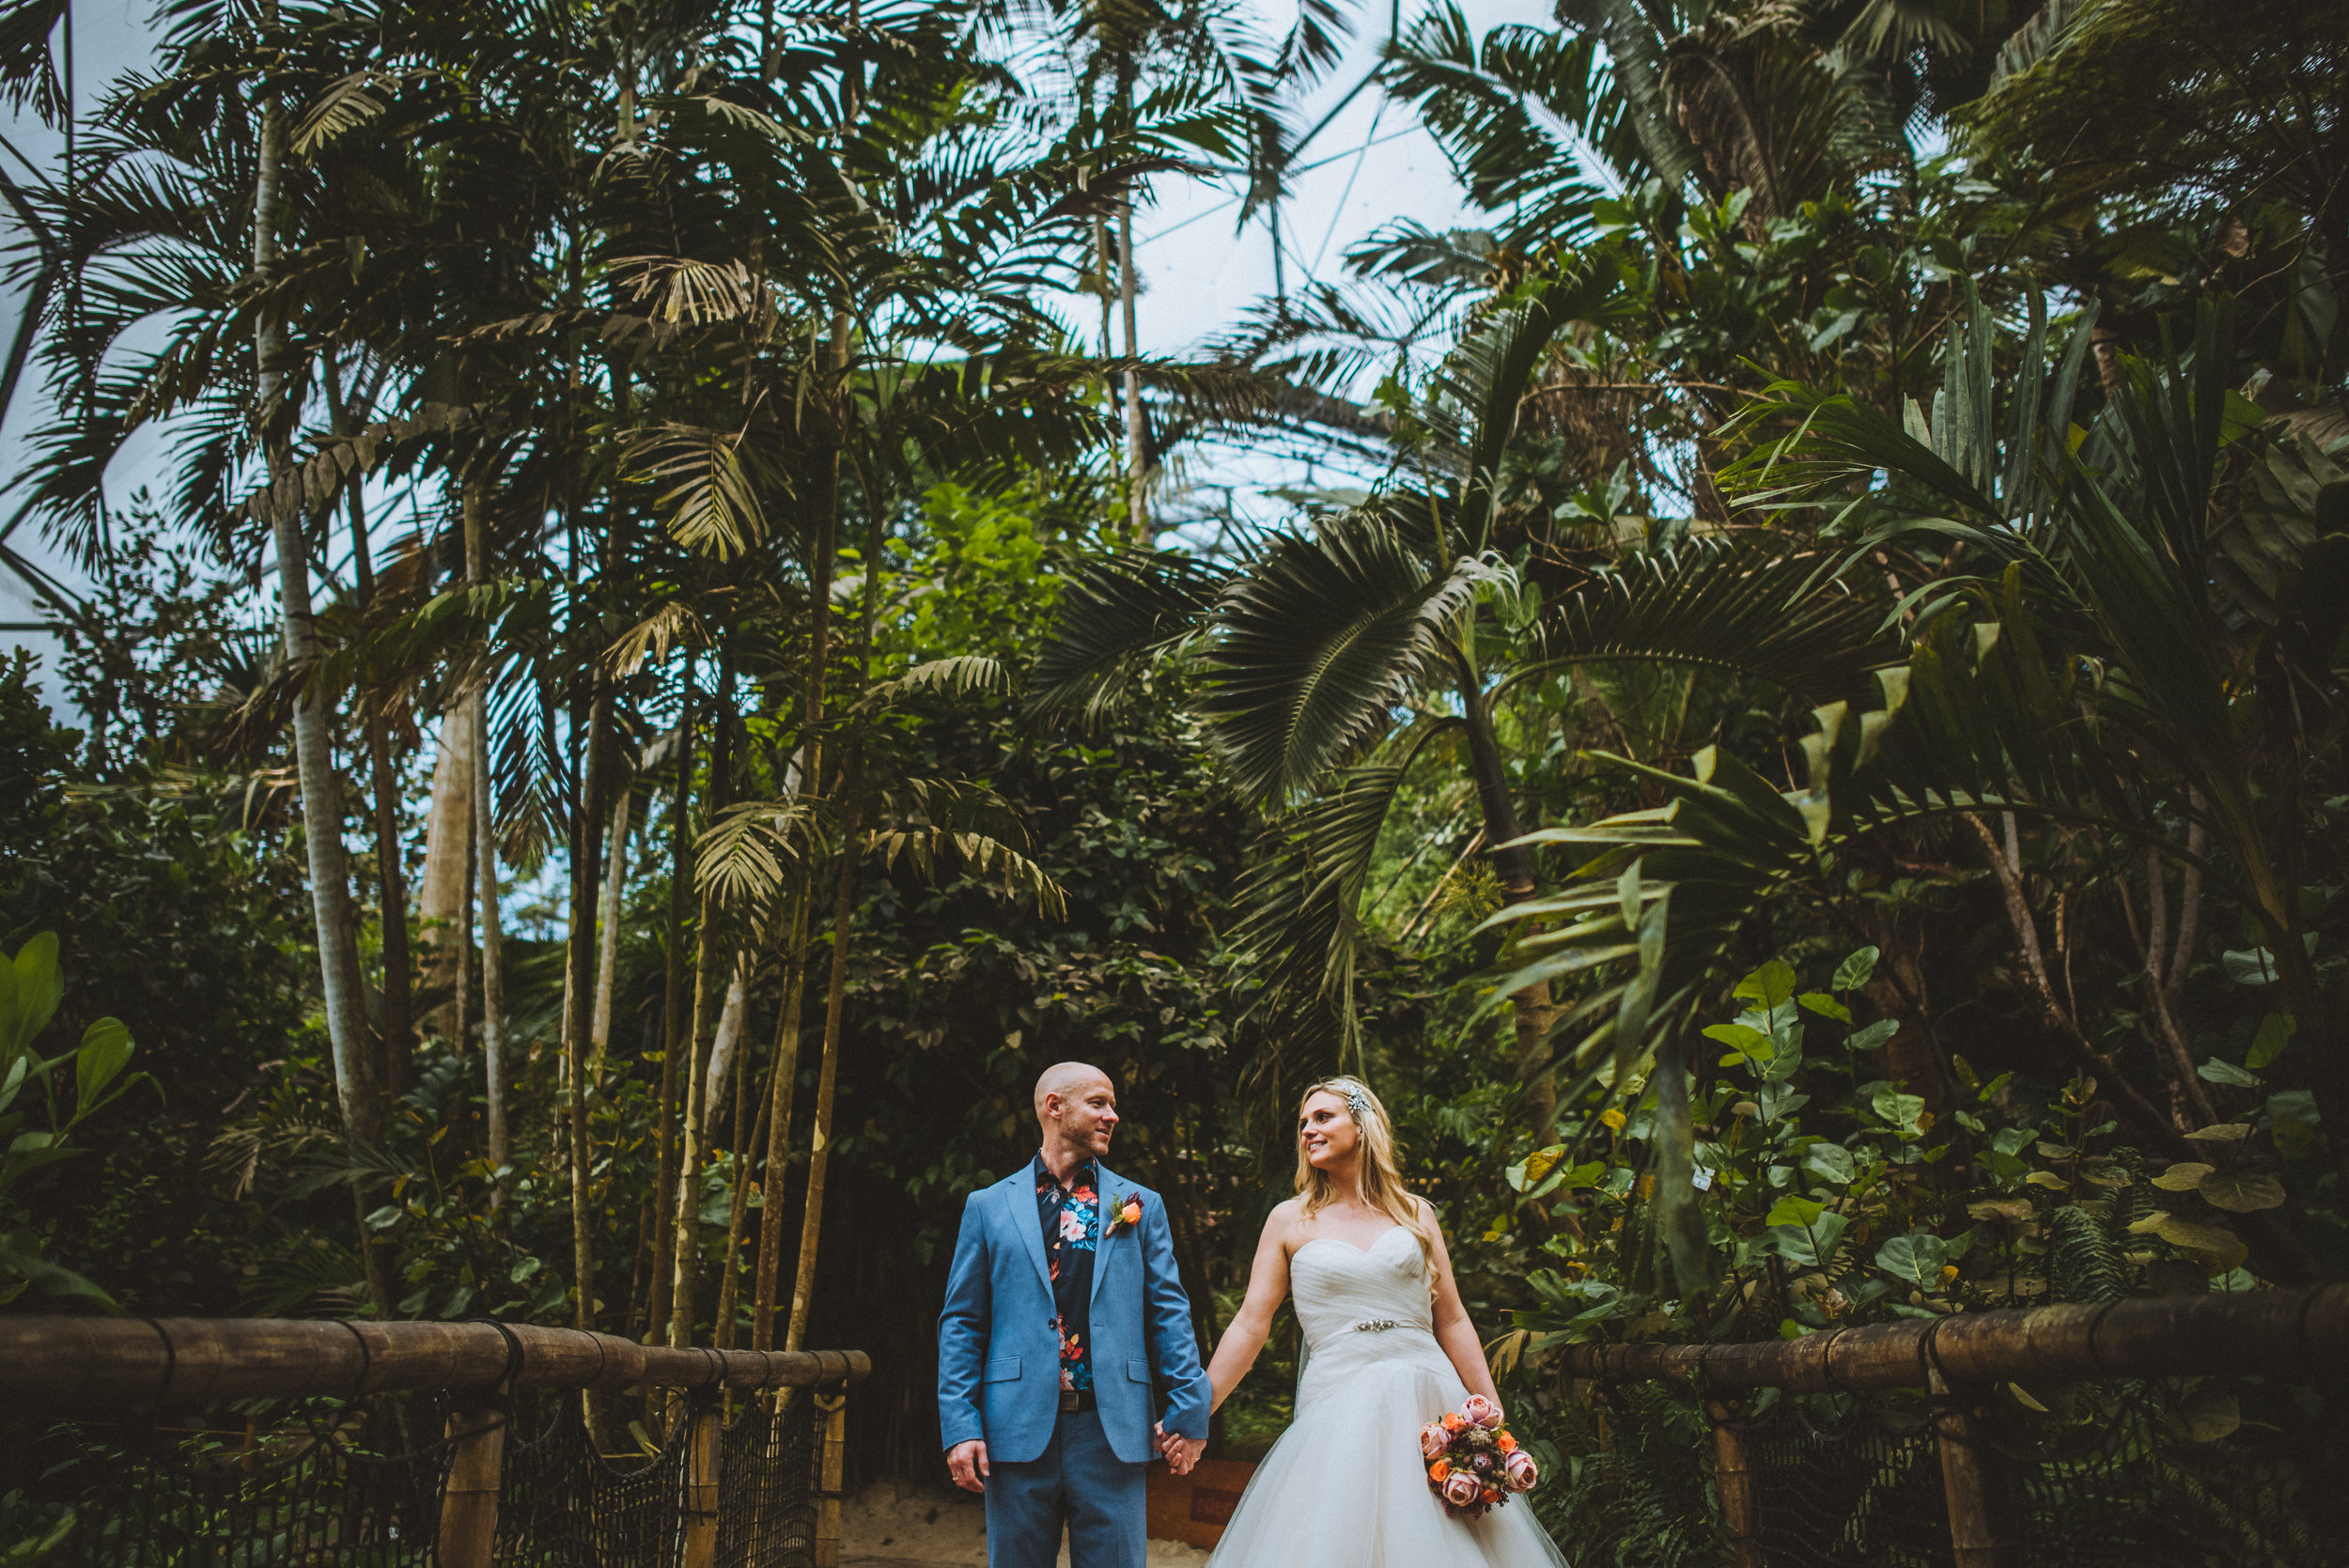 wedding-photographer-eden-project-1.jpg